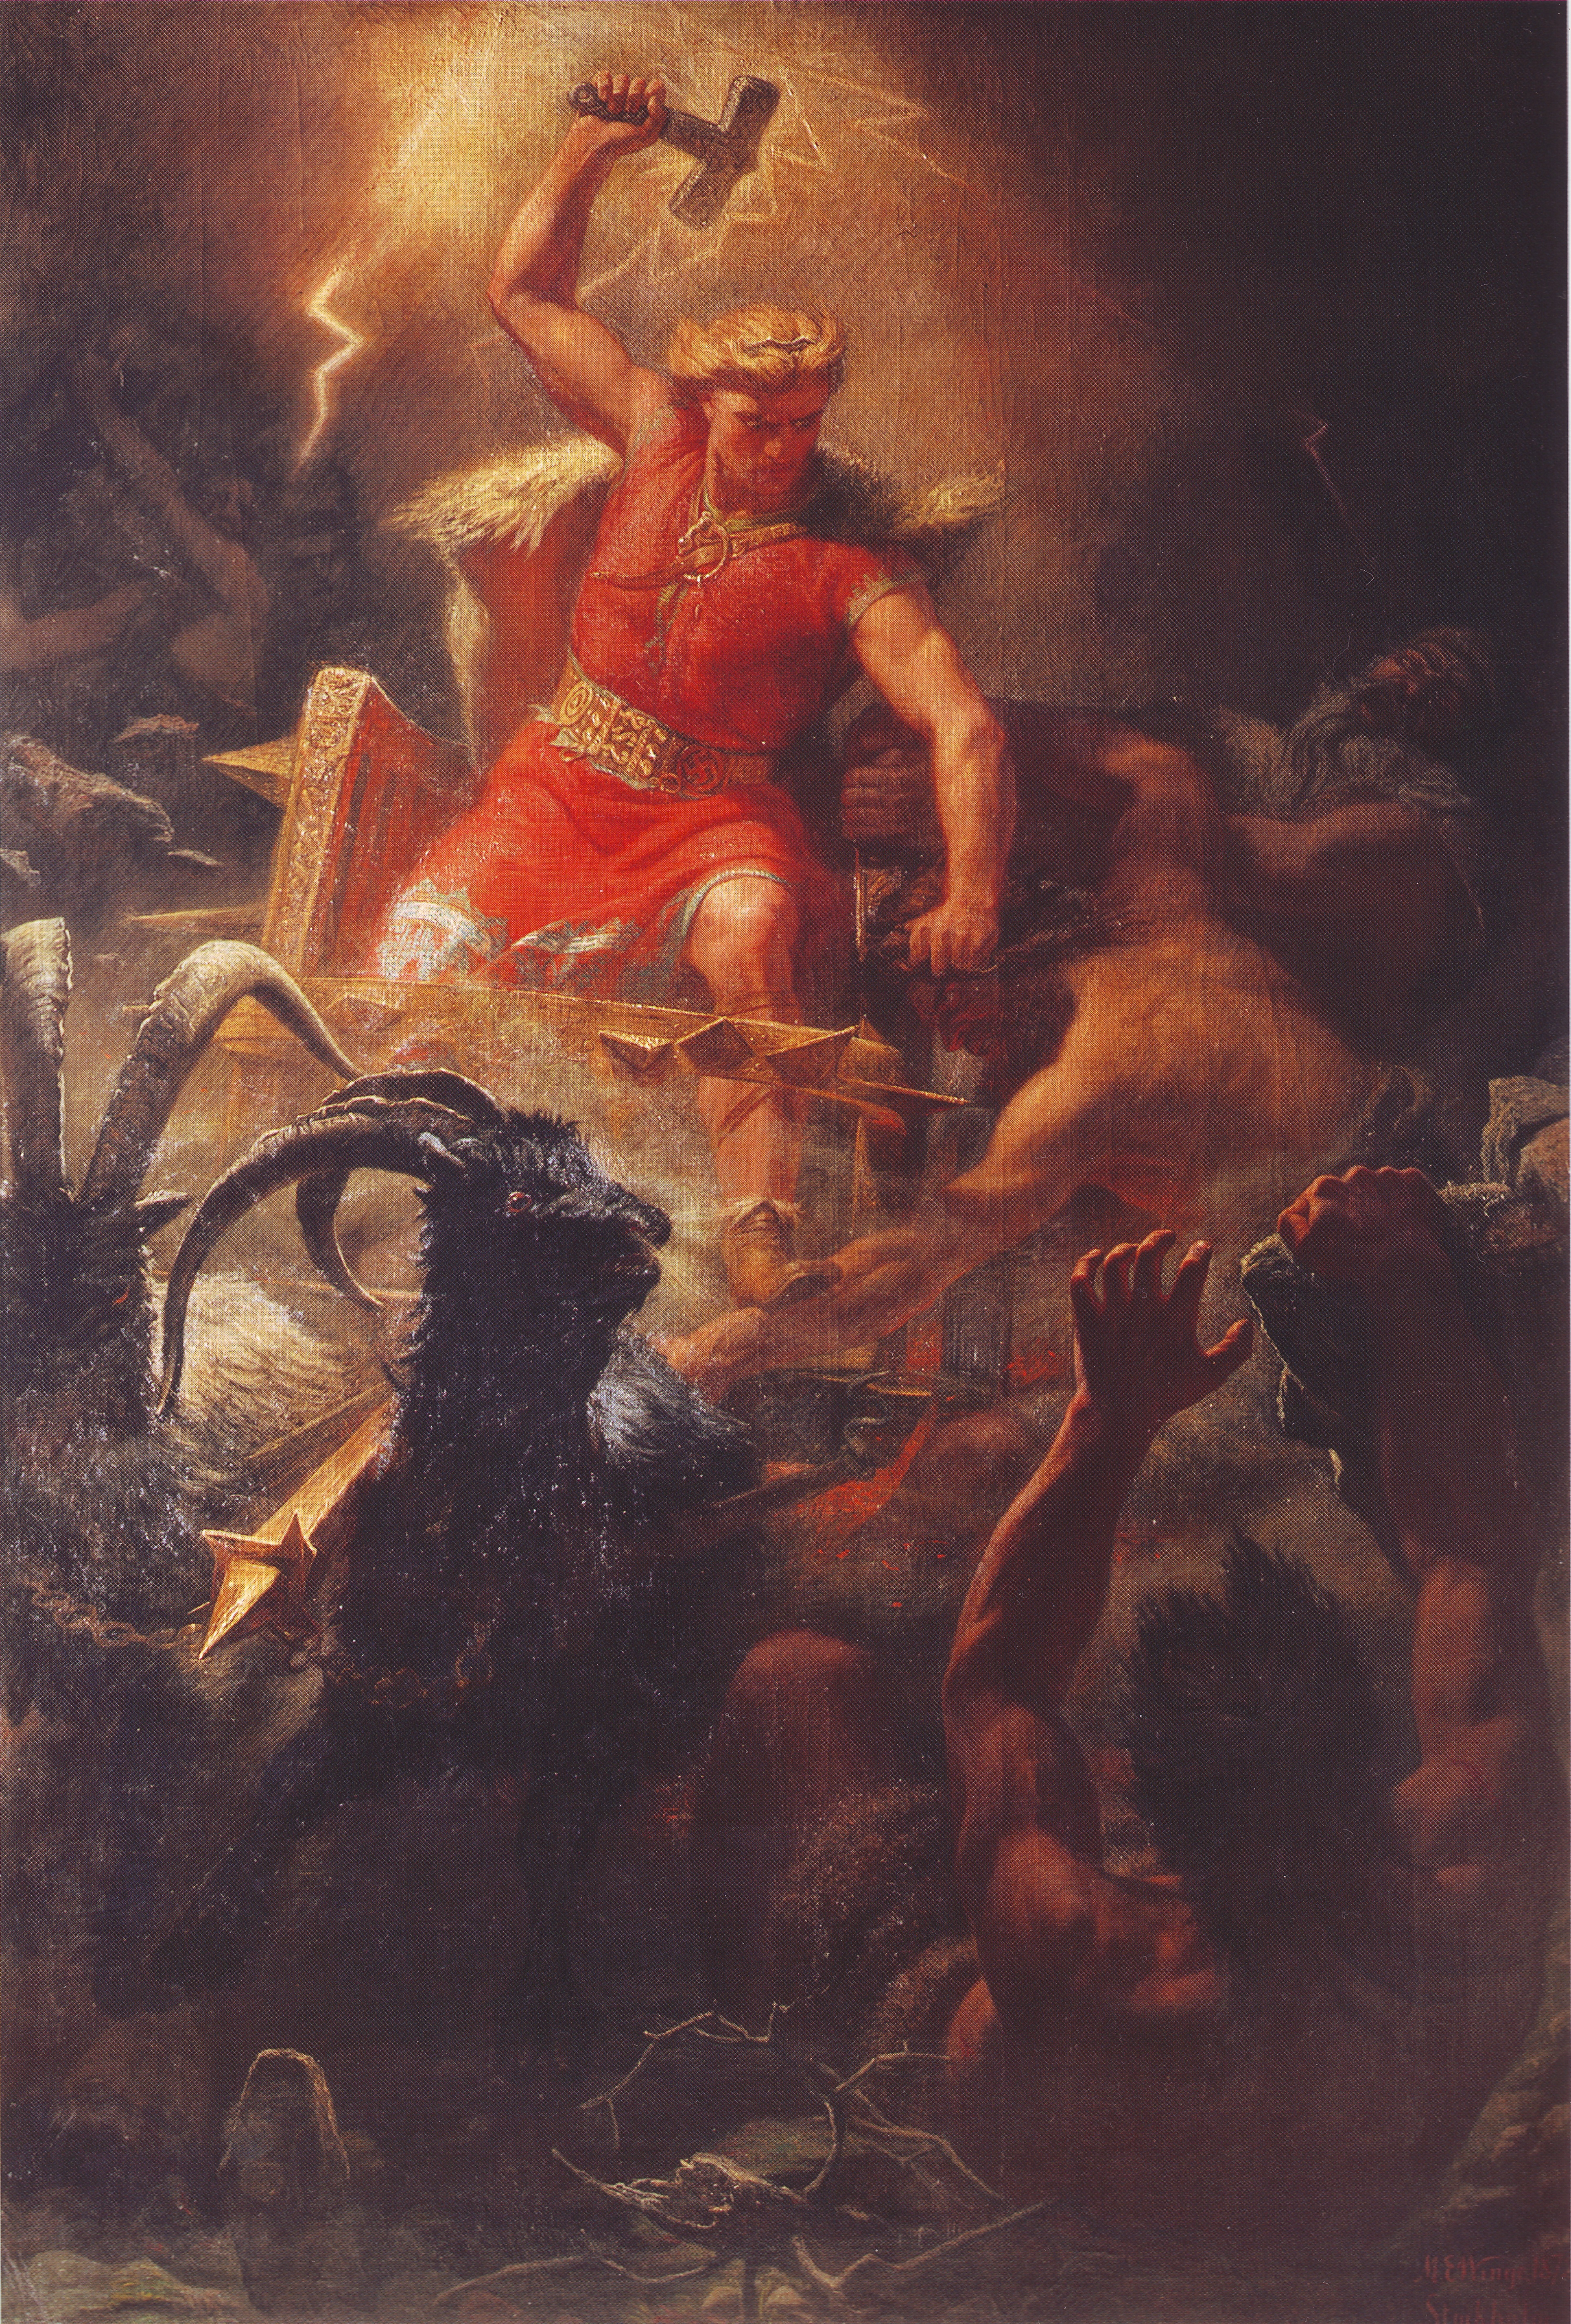 Доклад про скандинавских богов 2720